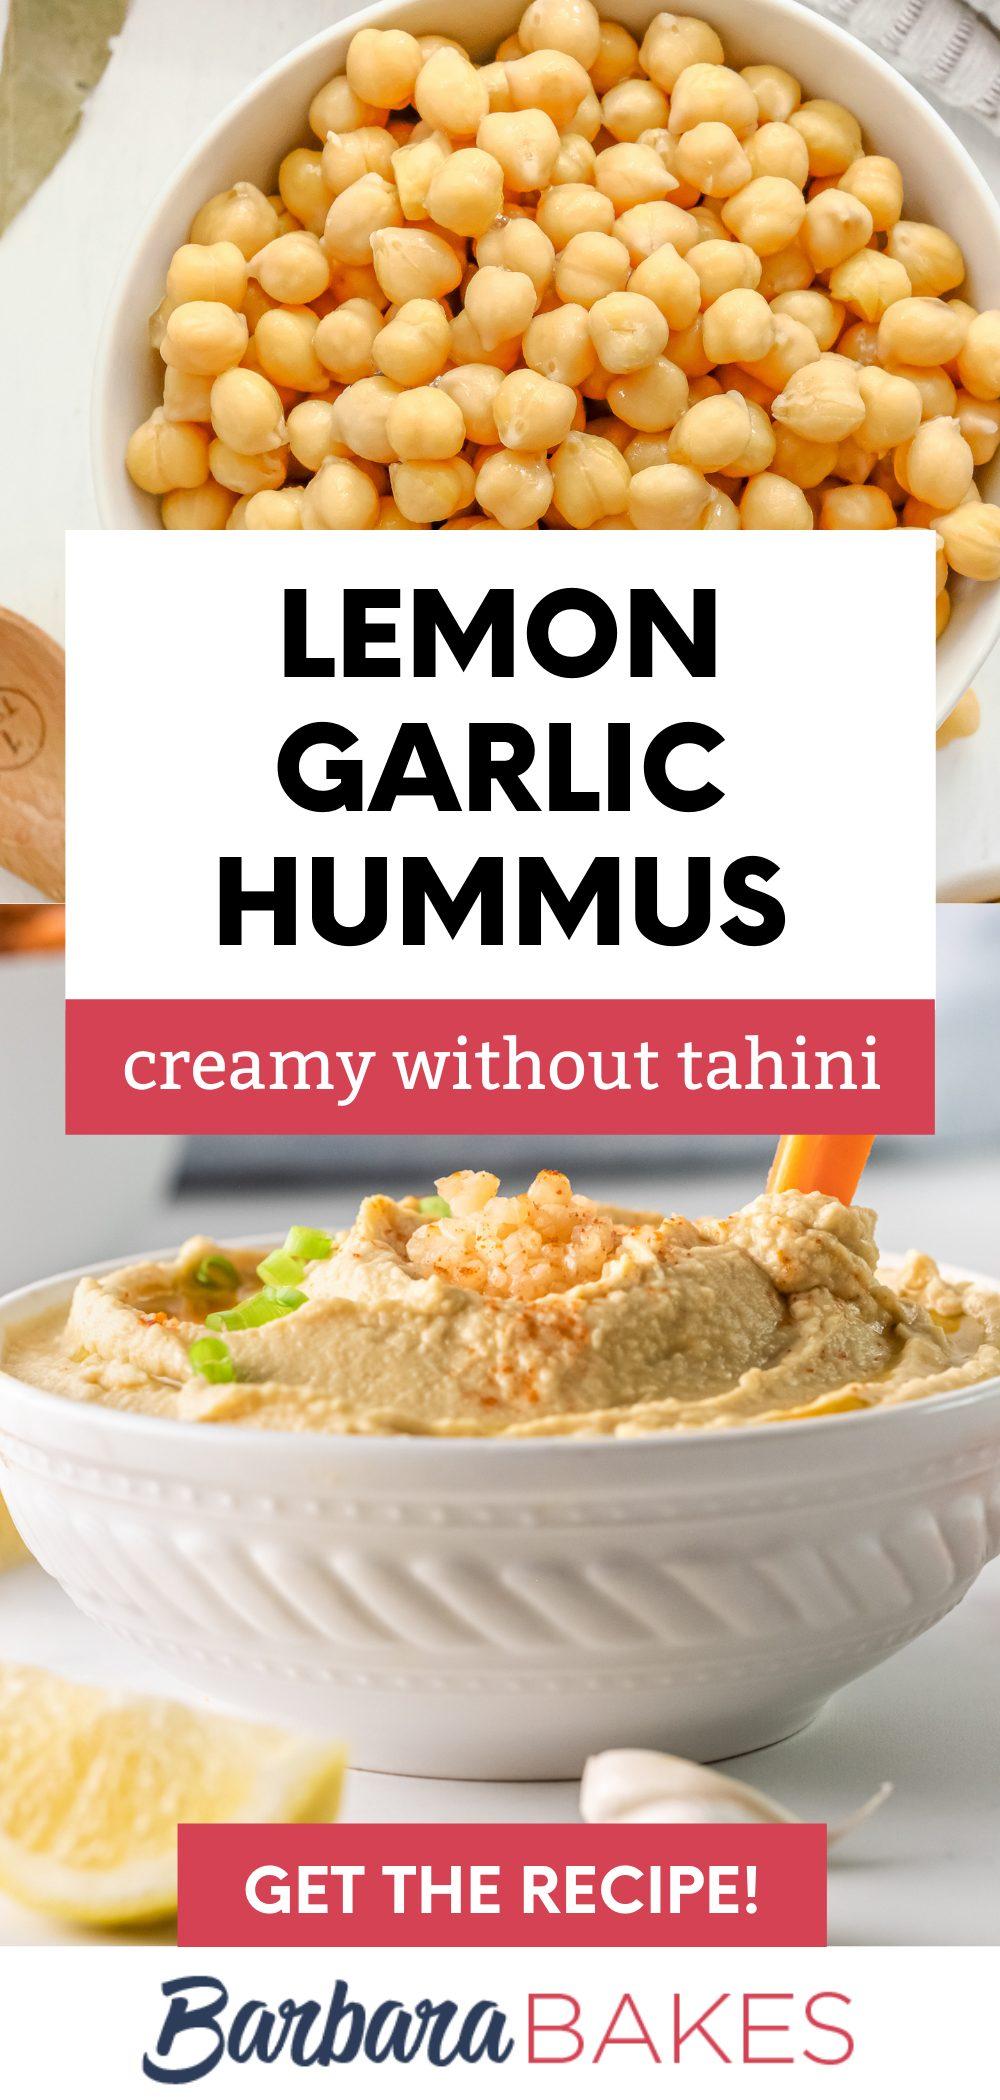 Lemon Garlic Hummus via @barbarabakes